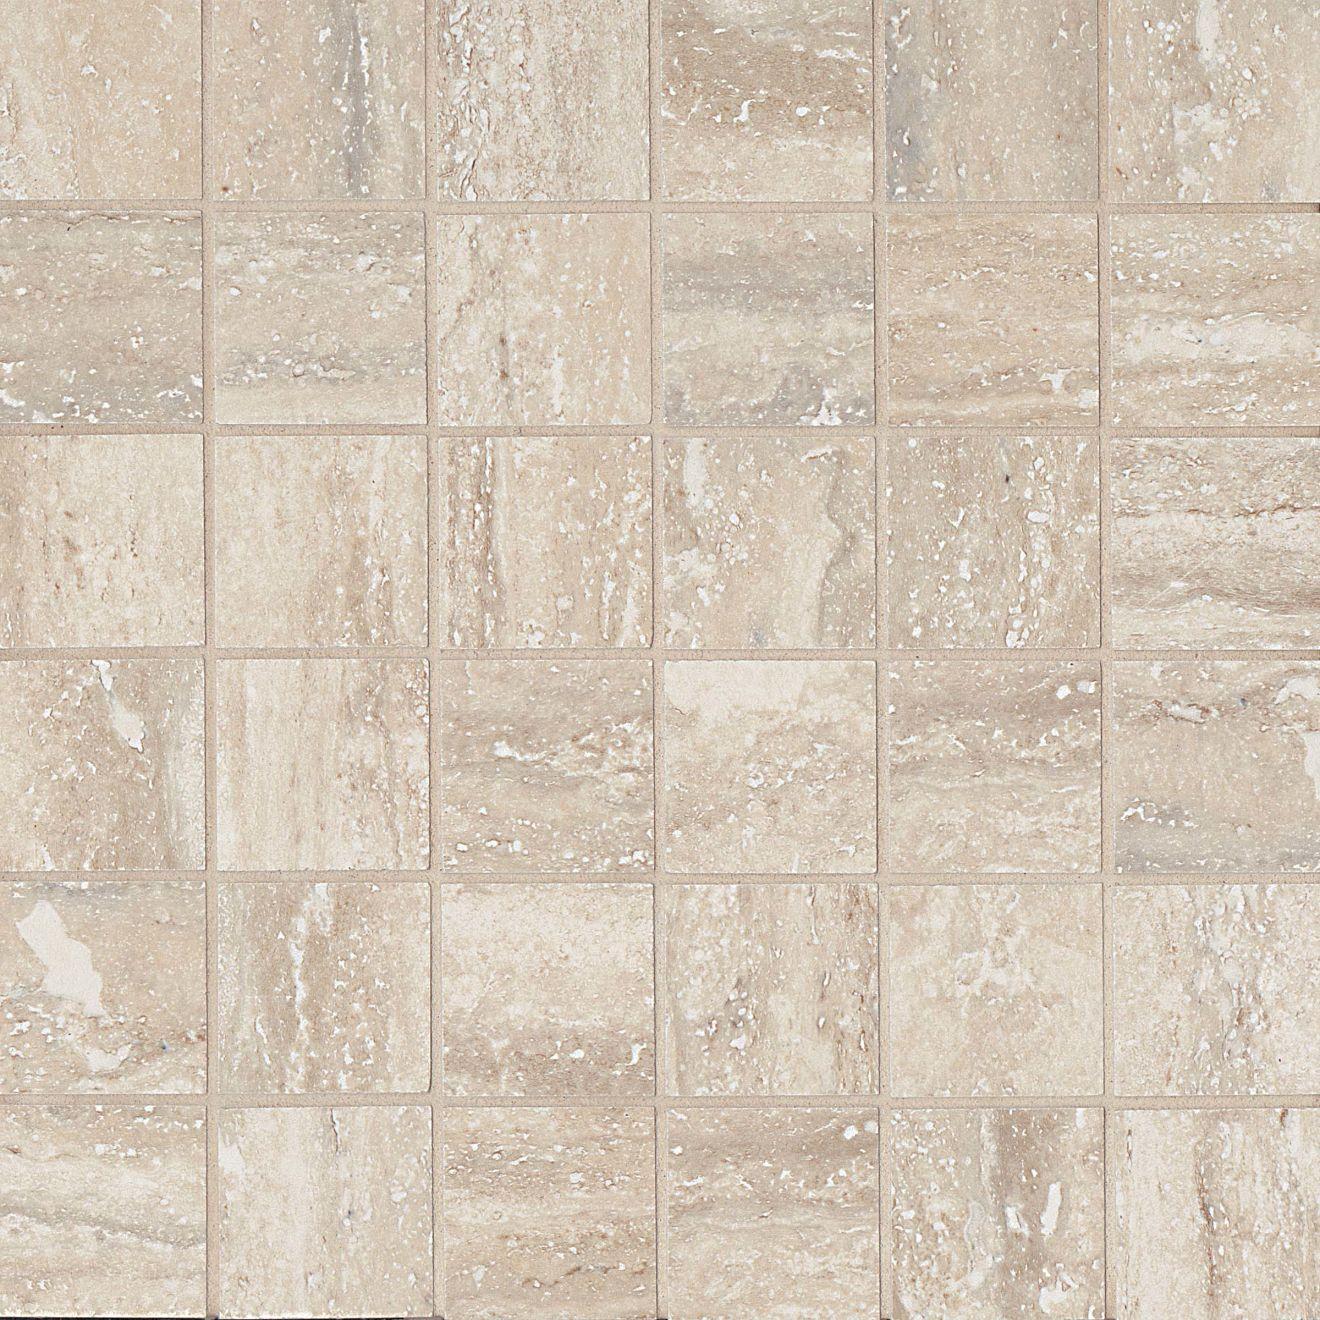 "Toscano 2"" x 2"" Floor & Wall Mosaic in Silver"